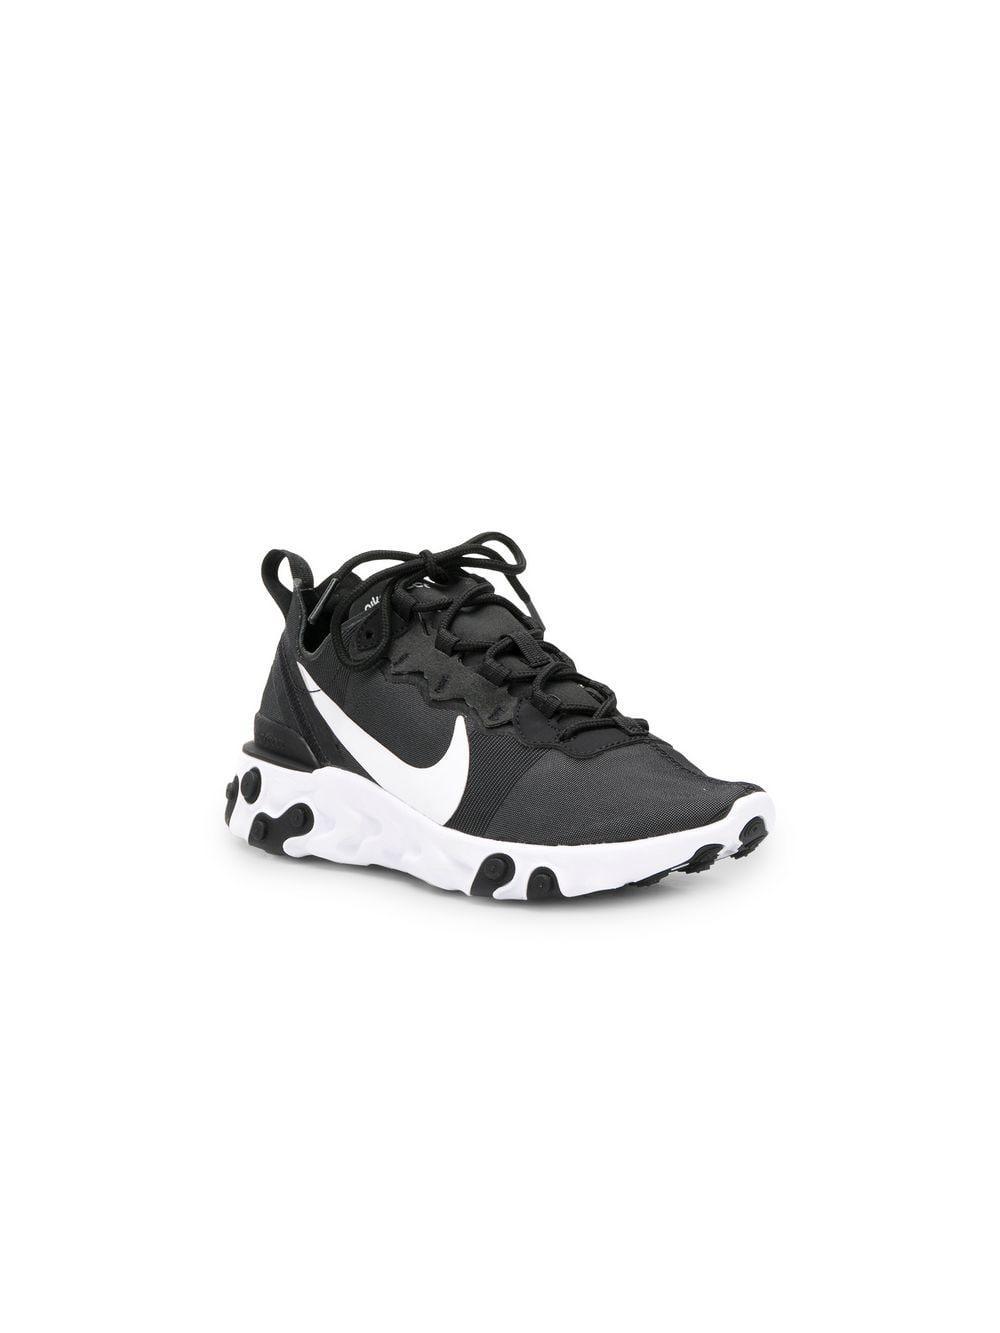 ccf9d94805e7 Lyst - Nike React Element 55 Black  White in Black - Save 13%